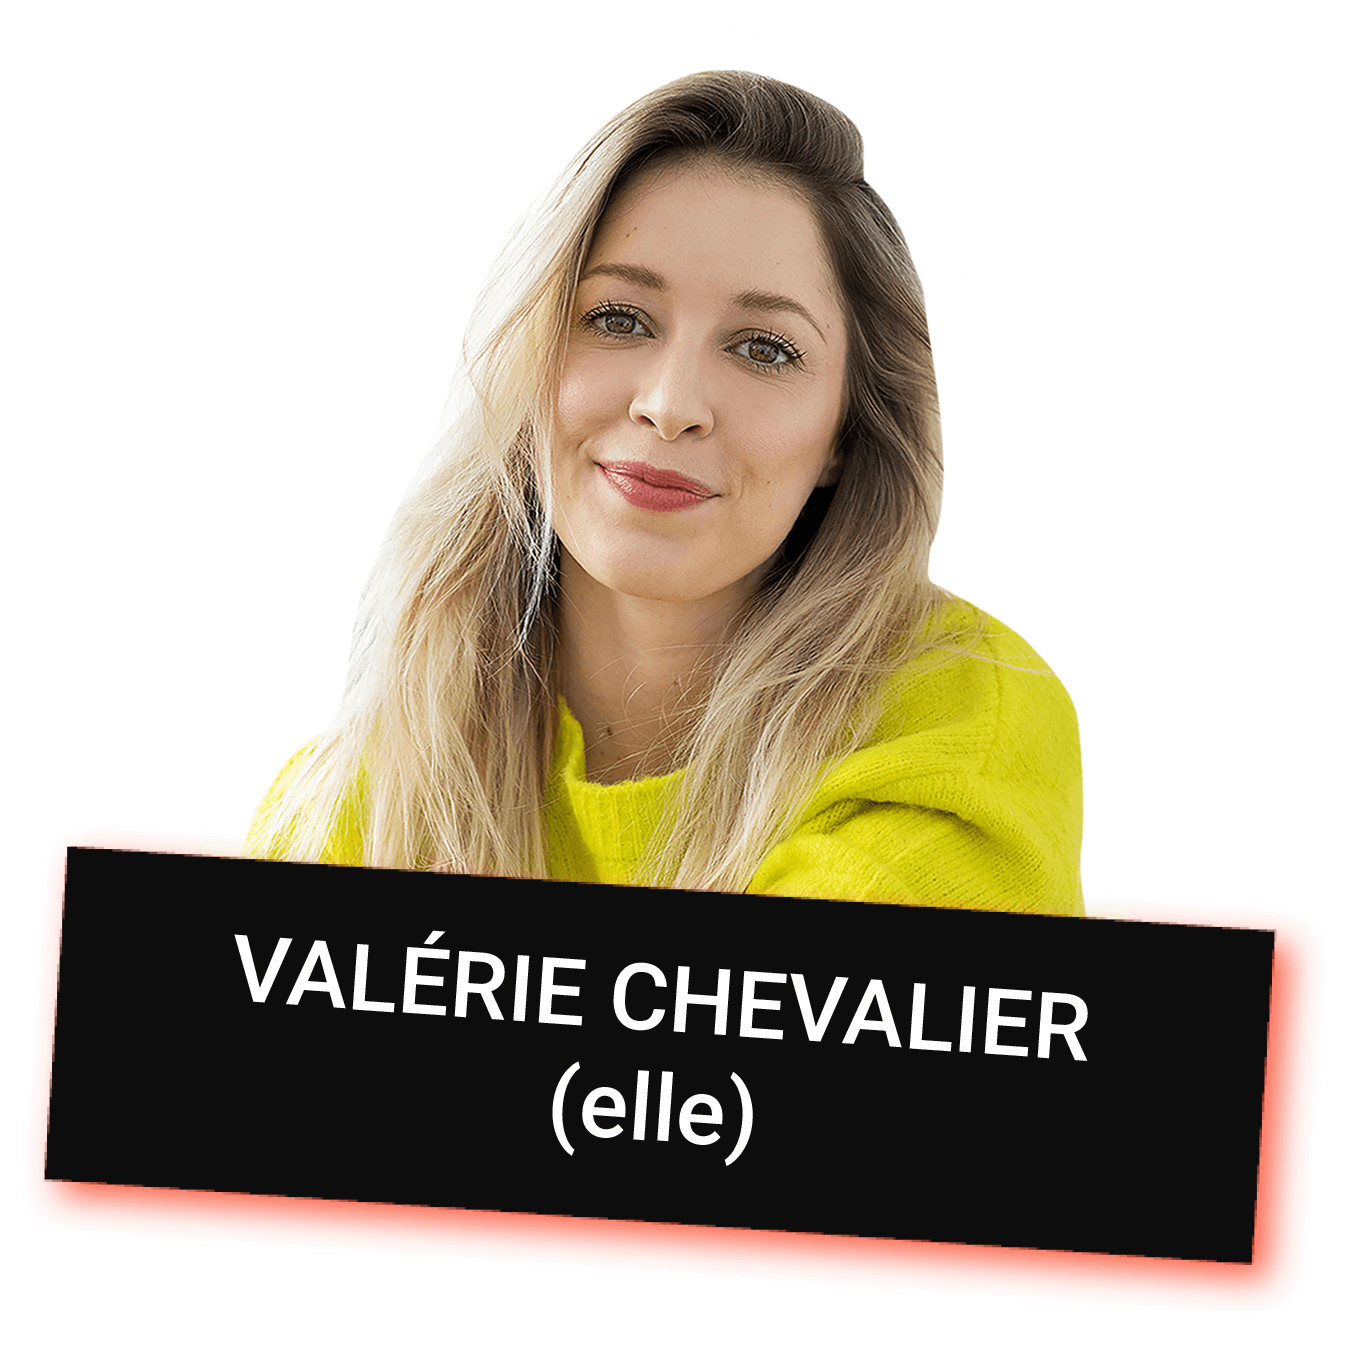 Valérie Chevalier